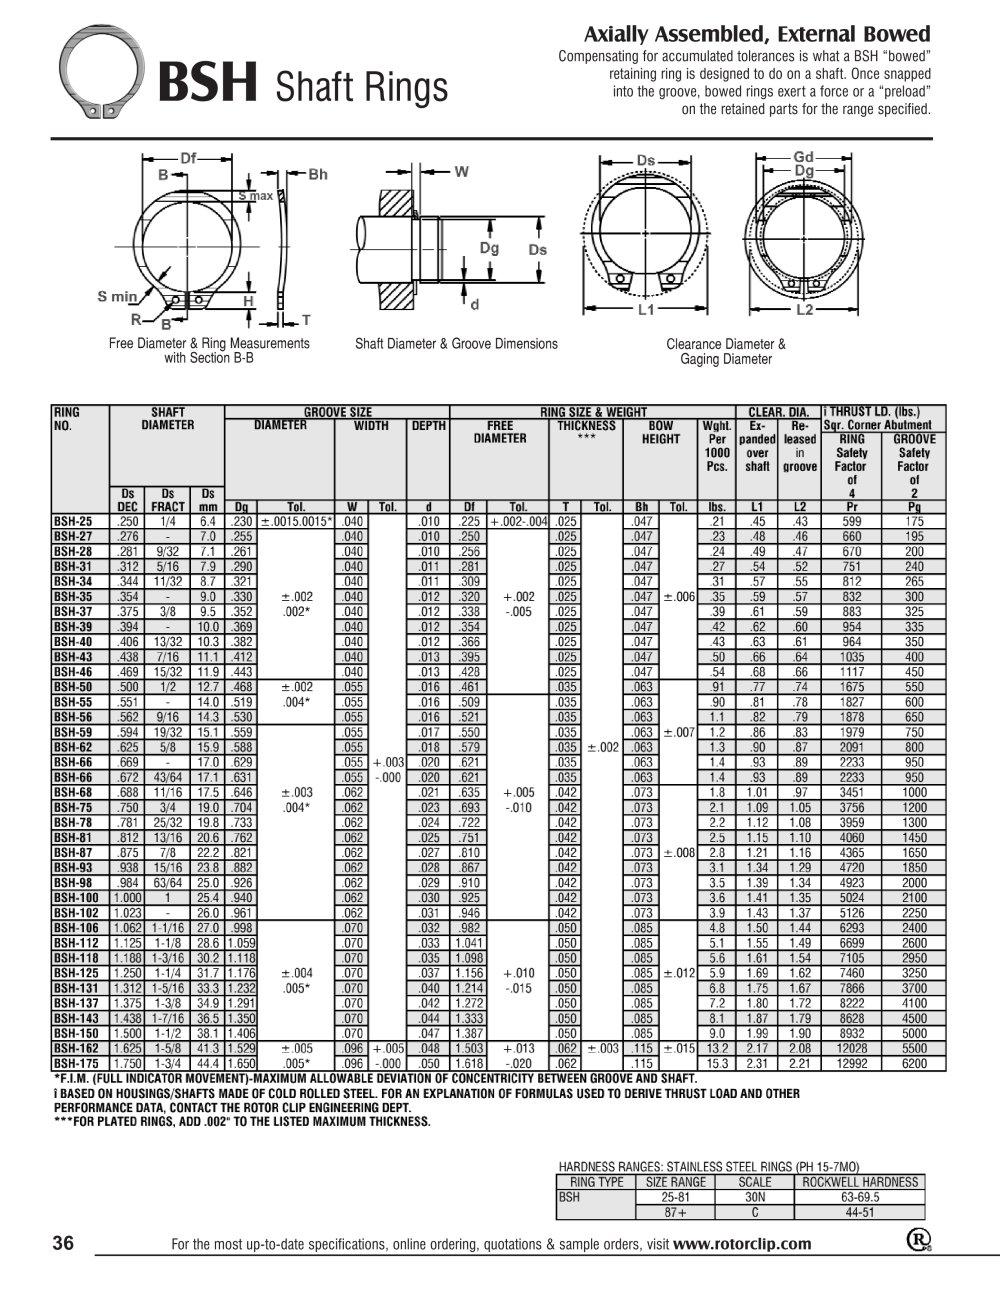 retaining ring dimensions